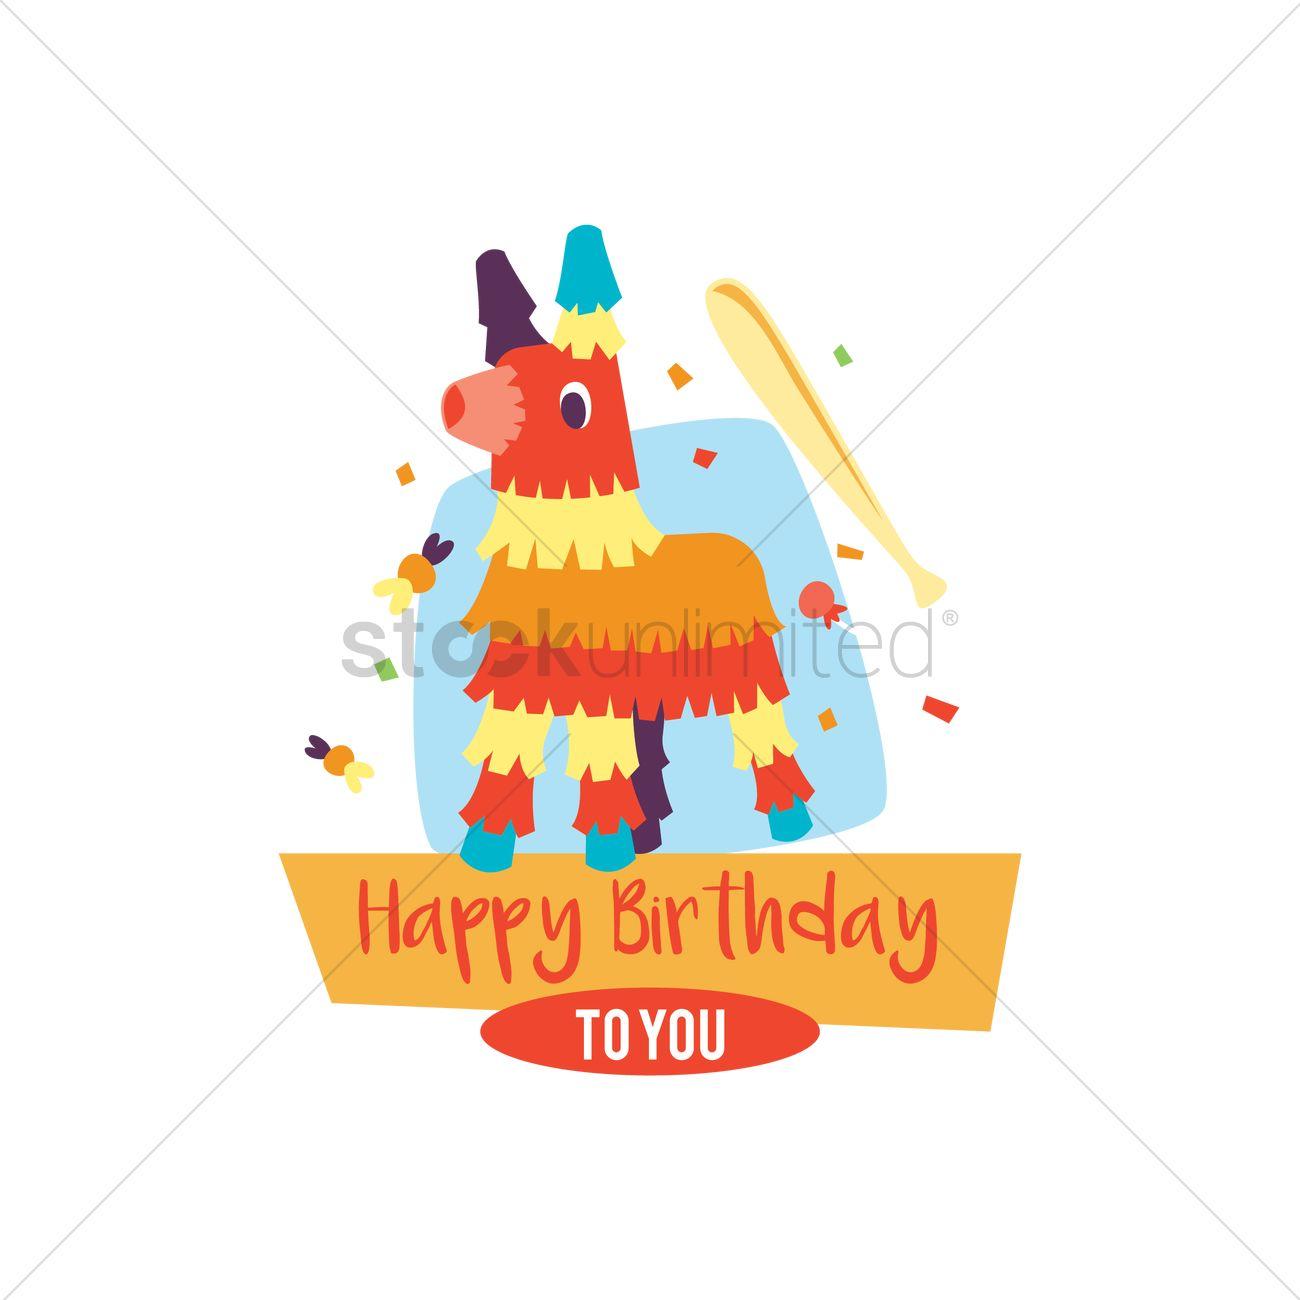 1300x1300 Happy Birthday Card With Pinata Vector Image